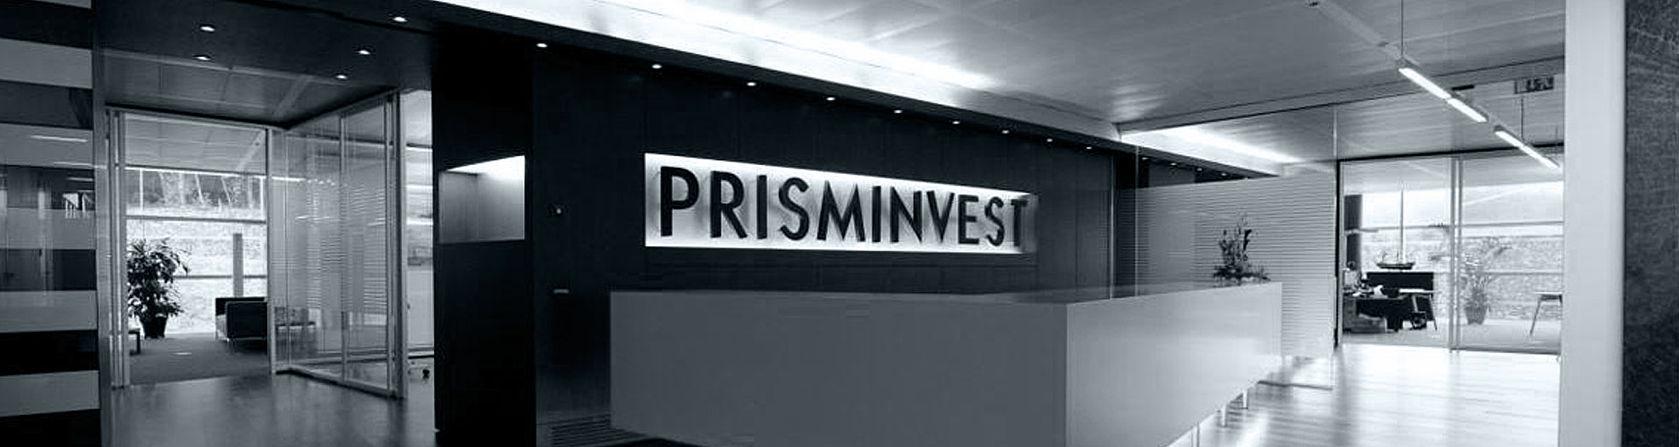 Prisminvest's offices